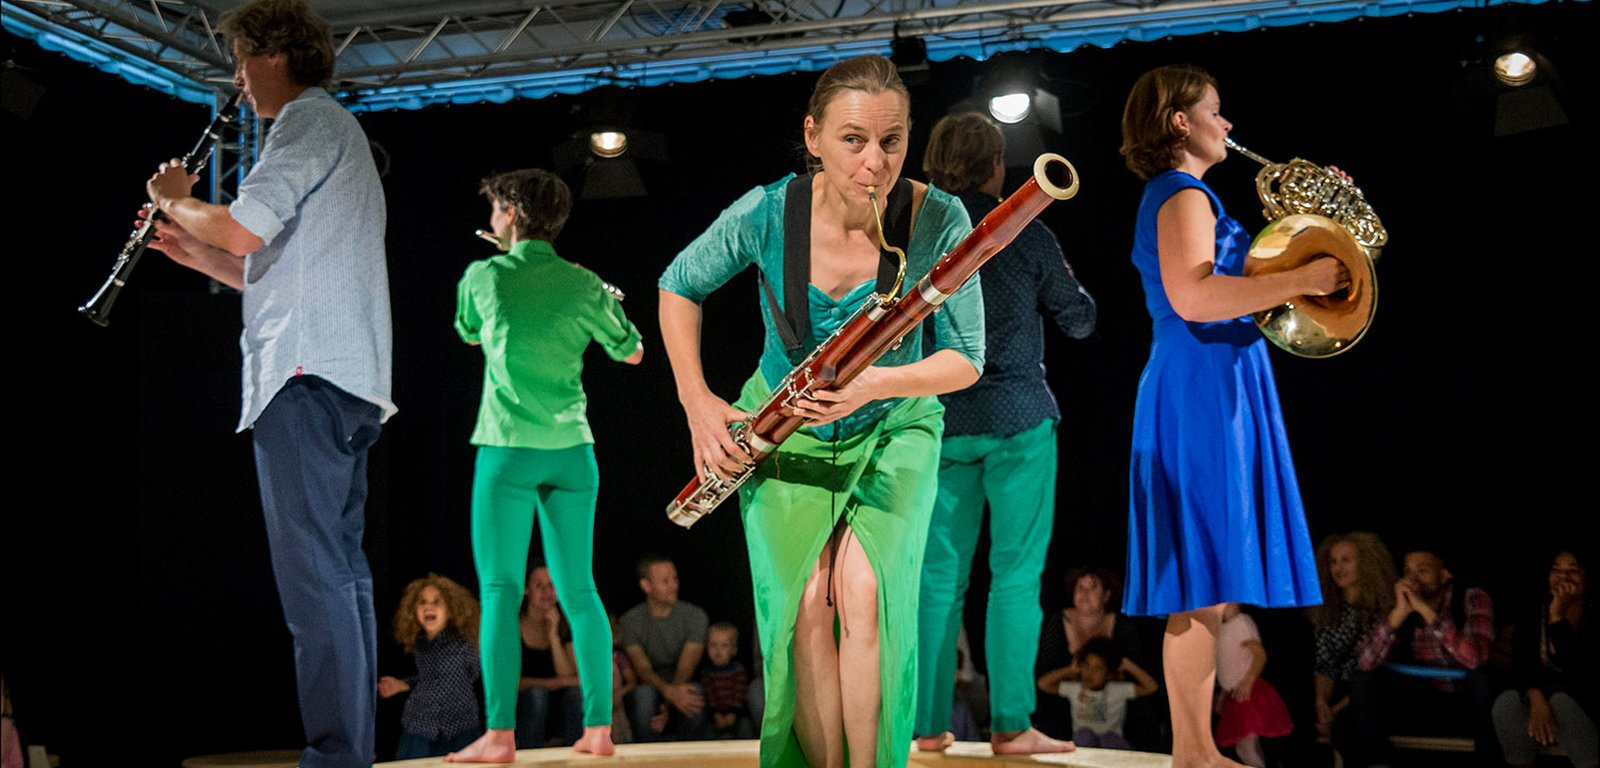 Twinkle Concert S / Wirbel